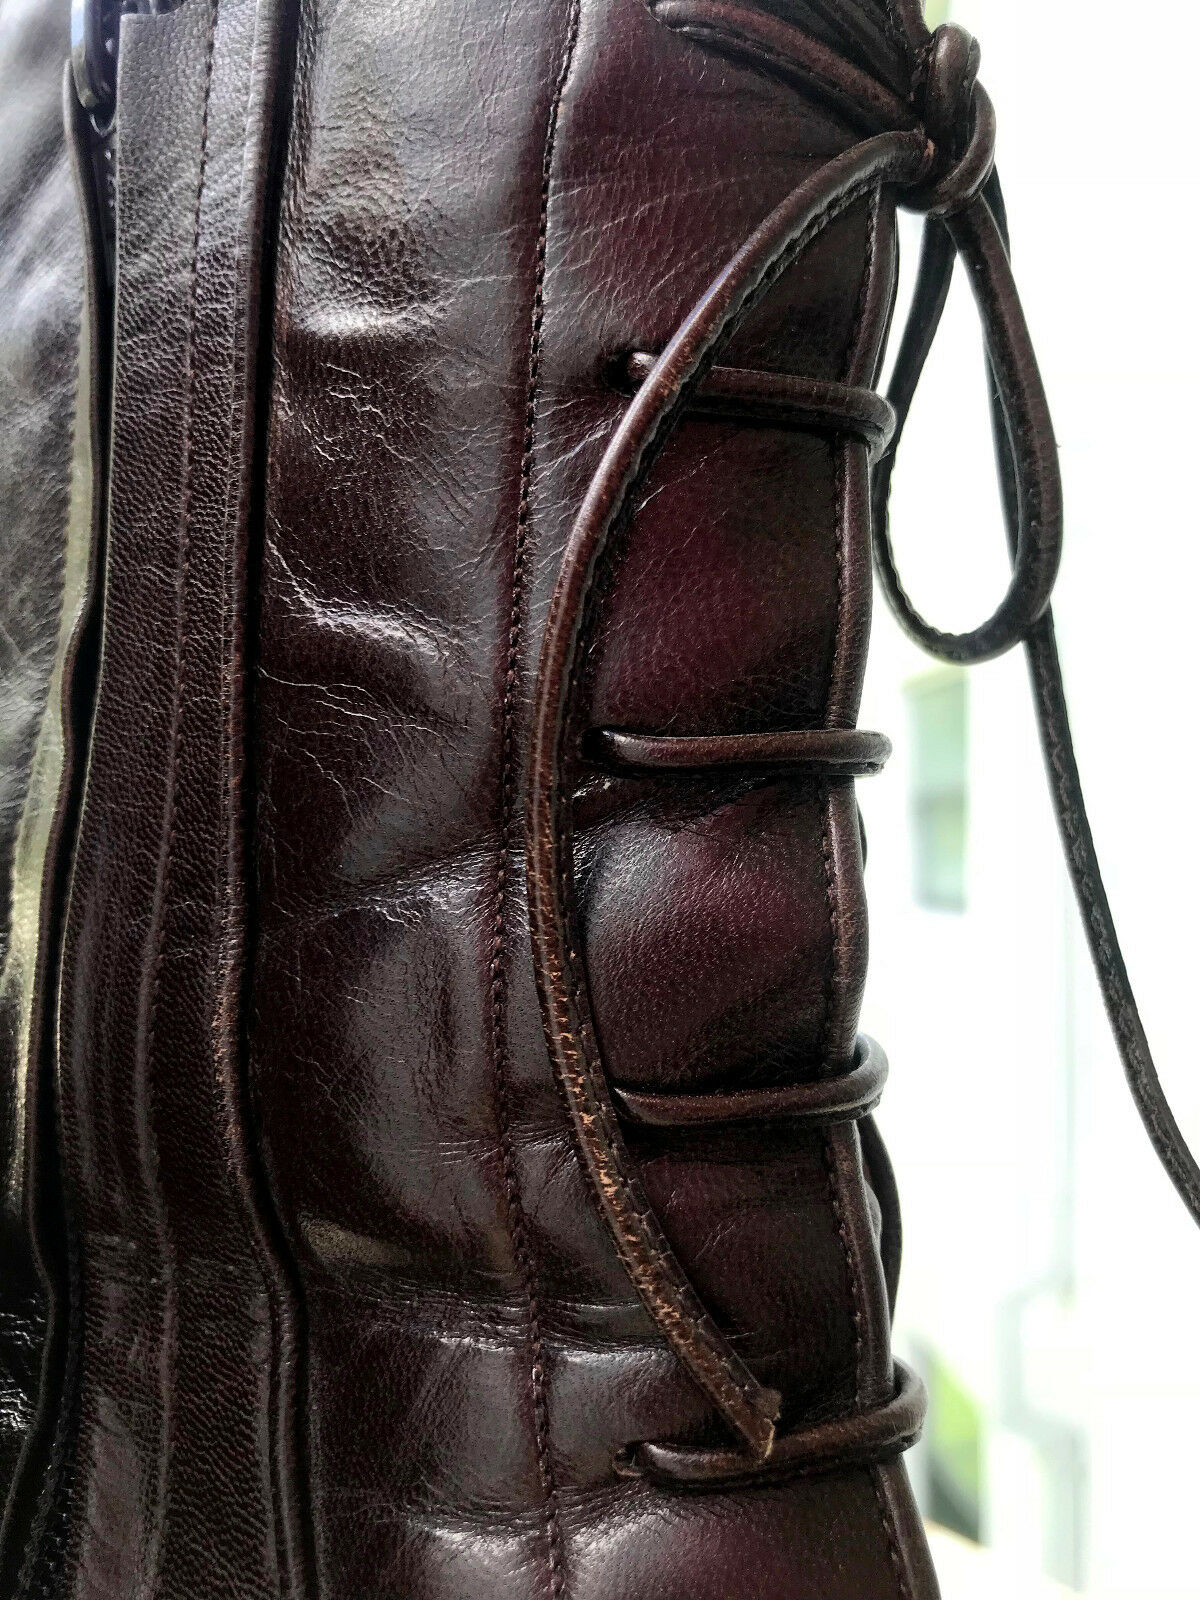 Celine Burgundy Leather Pamps Pamps Pamps Stiefelies Ankle Stiefel Größe EU 38 465ac9